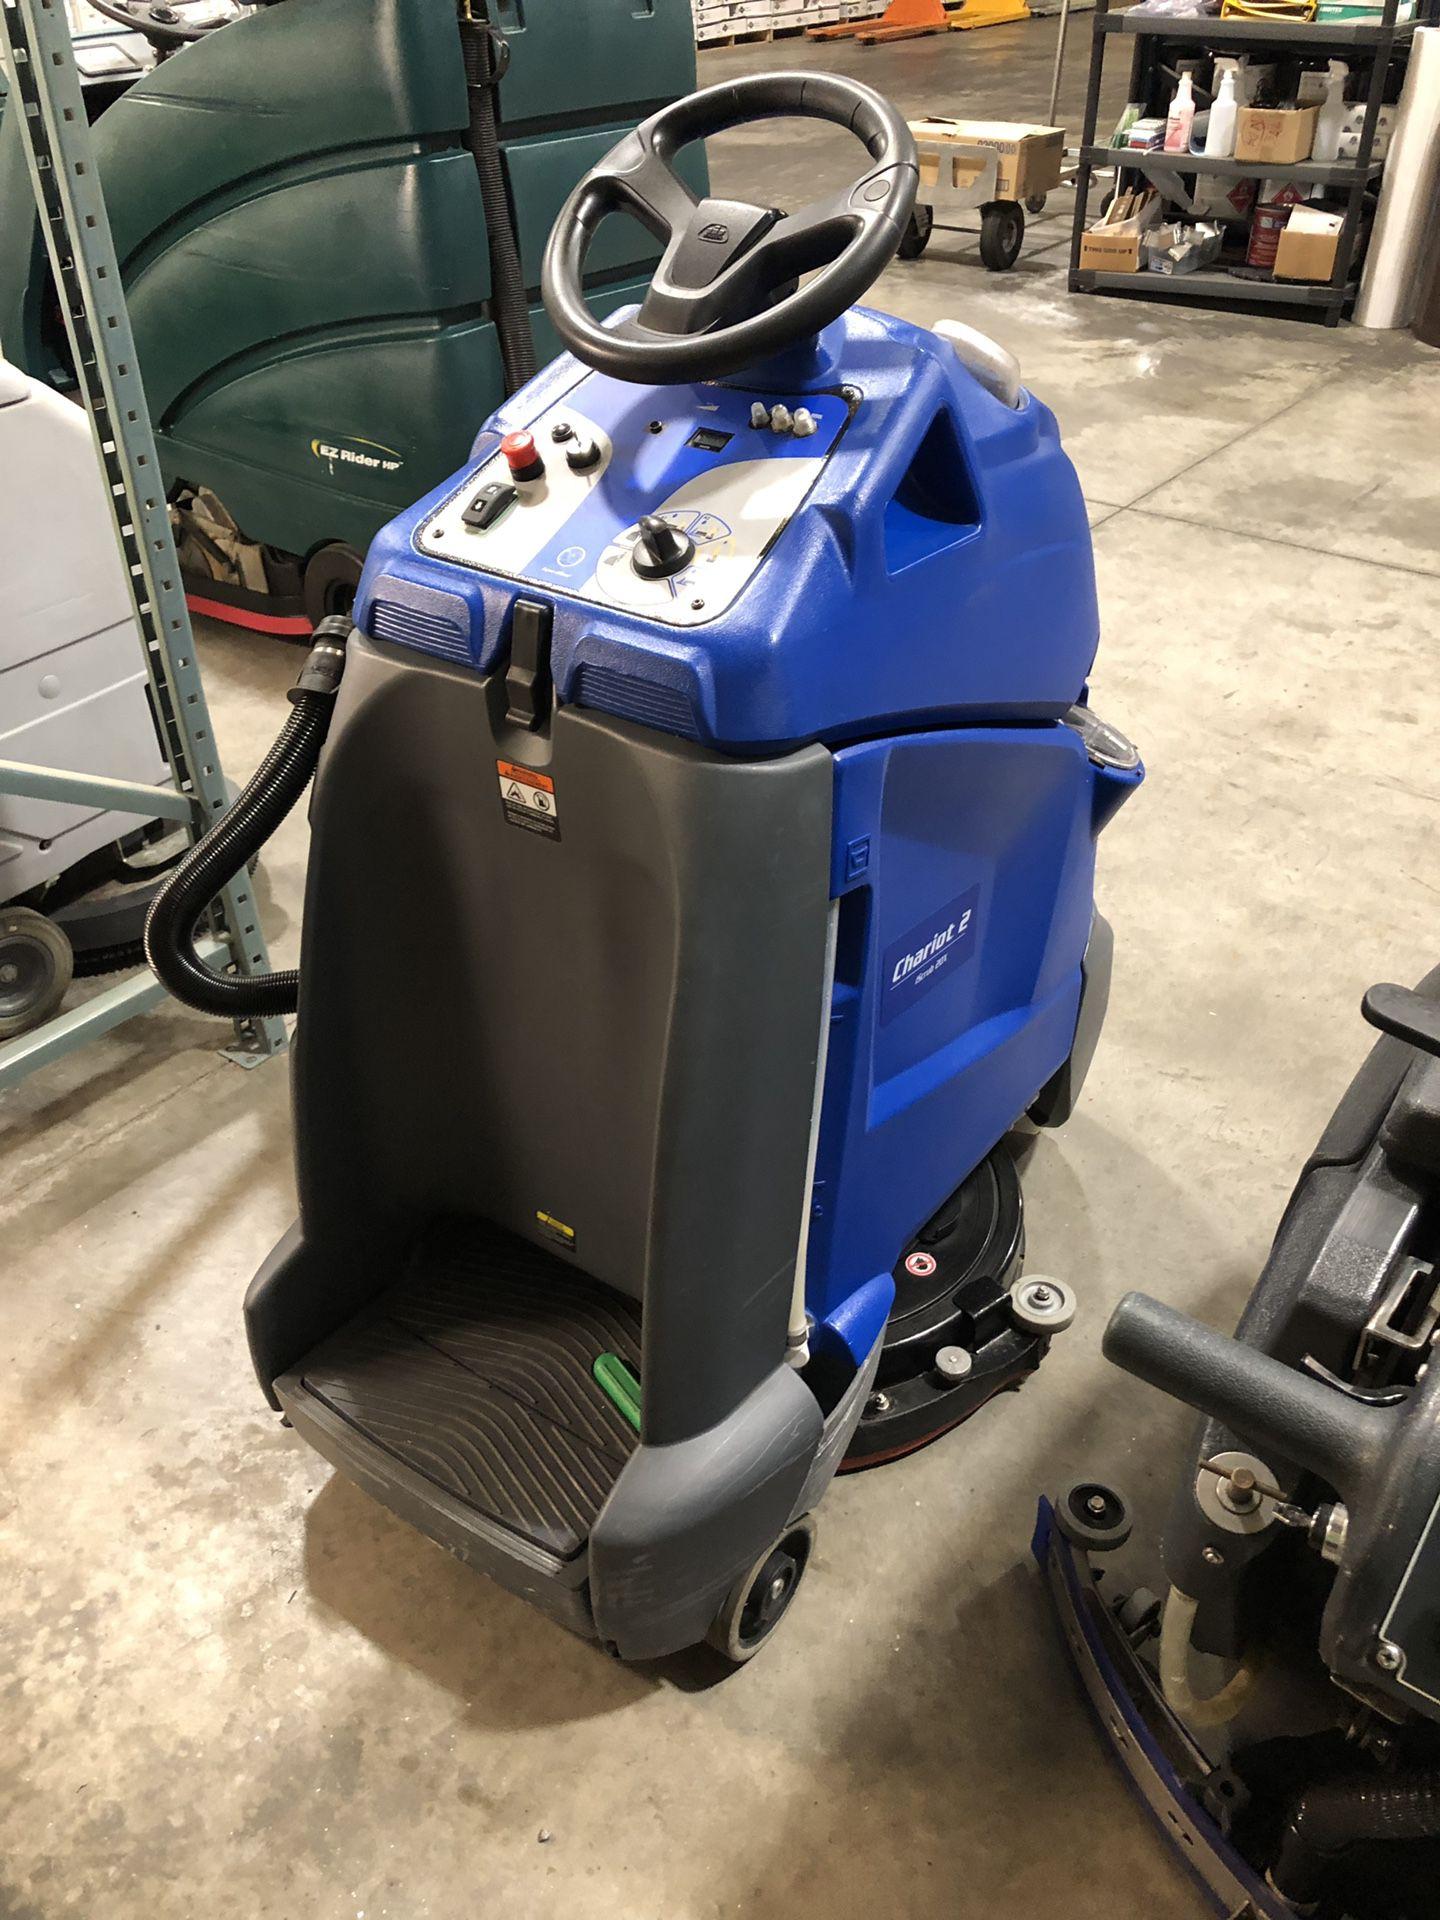 Windsor iScrub 2 20x stand on floor scrubber